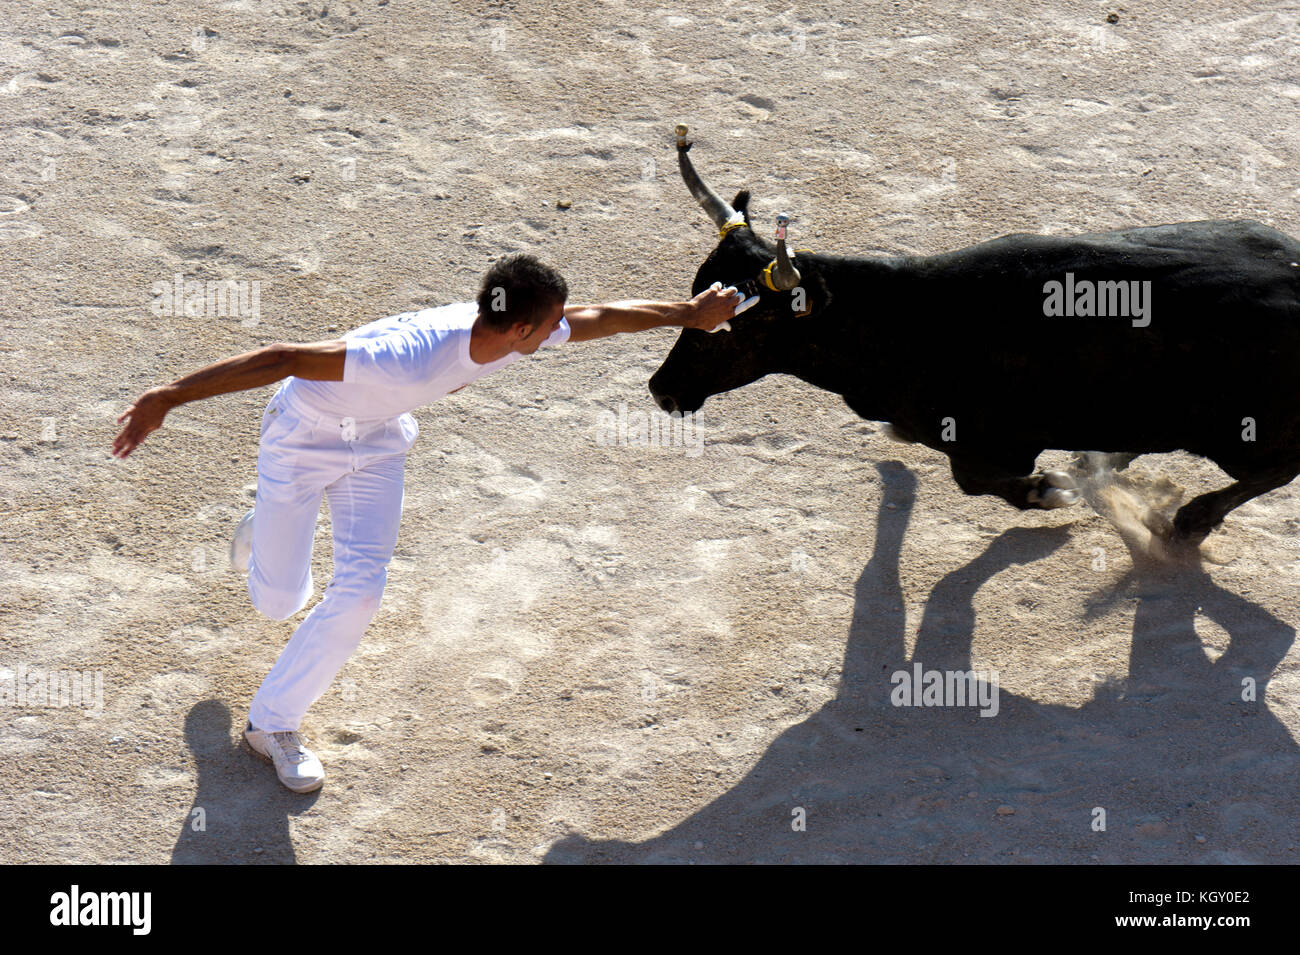 France, Bouches du Rhone (13), Camargue, Arles. Race Camargue, Bullfighting in the arena of Saintes Maries de la - Stock Image